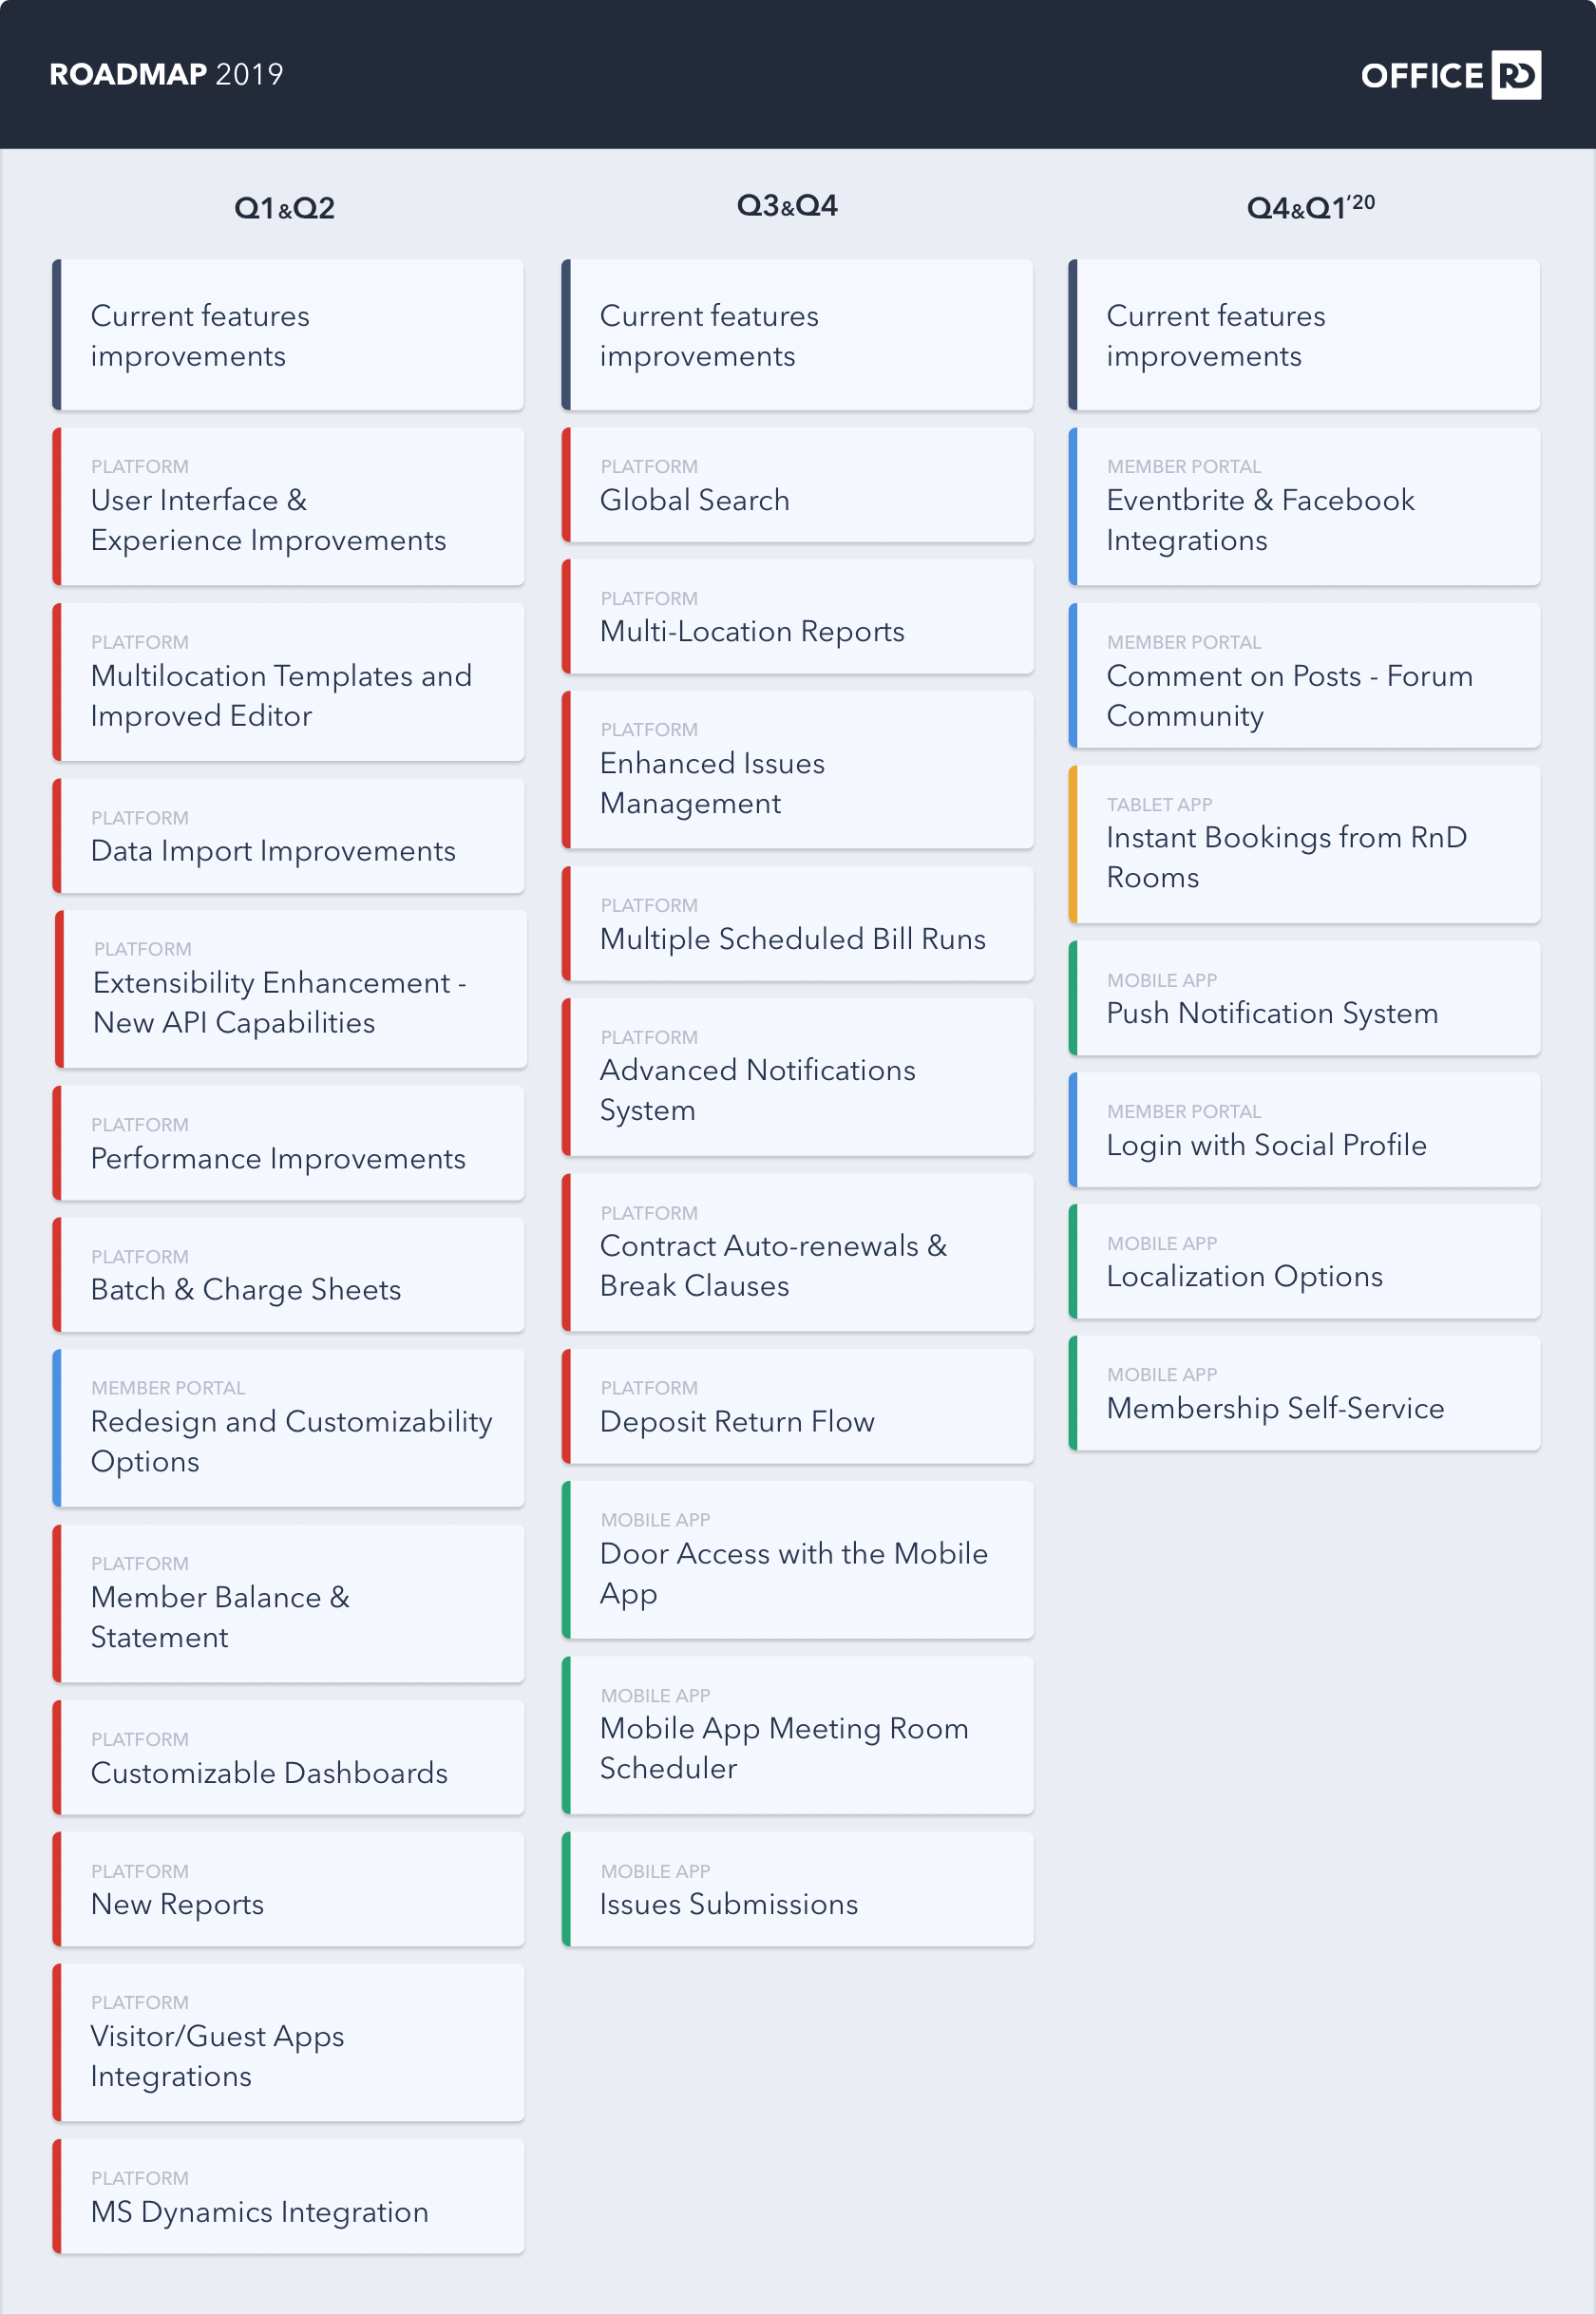 OfficeRnD Roadmap 2019